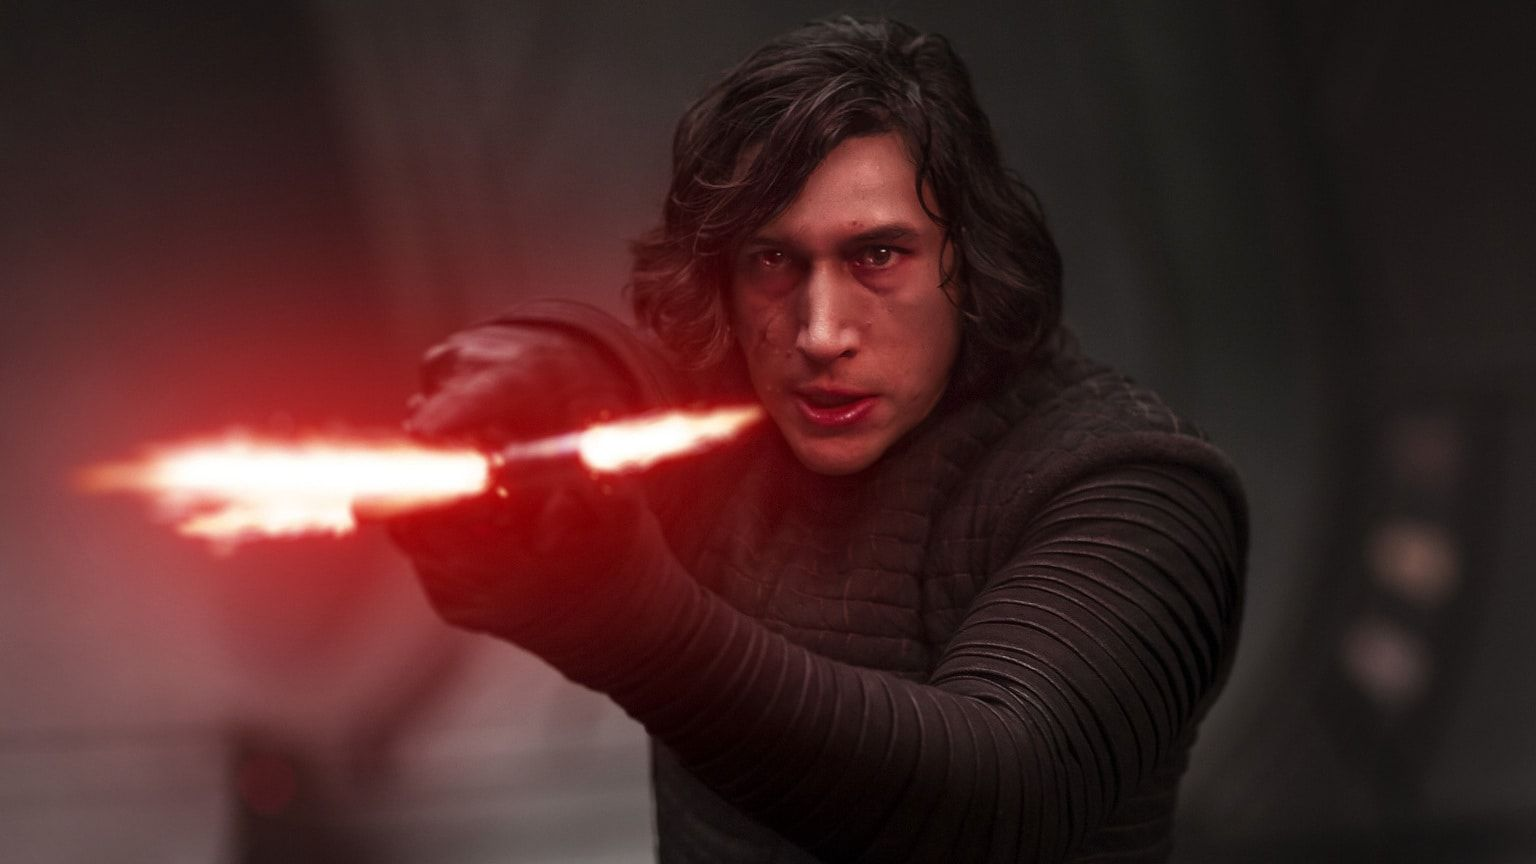 'Star Wars: Episode IX The Rise of Skywalker' Trailer ...